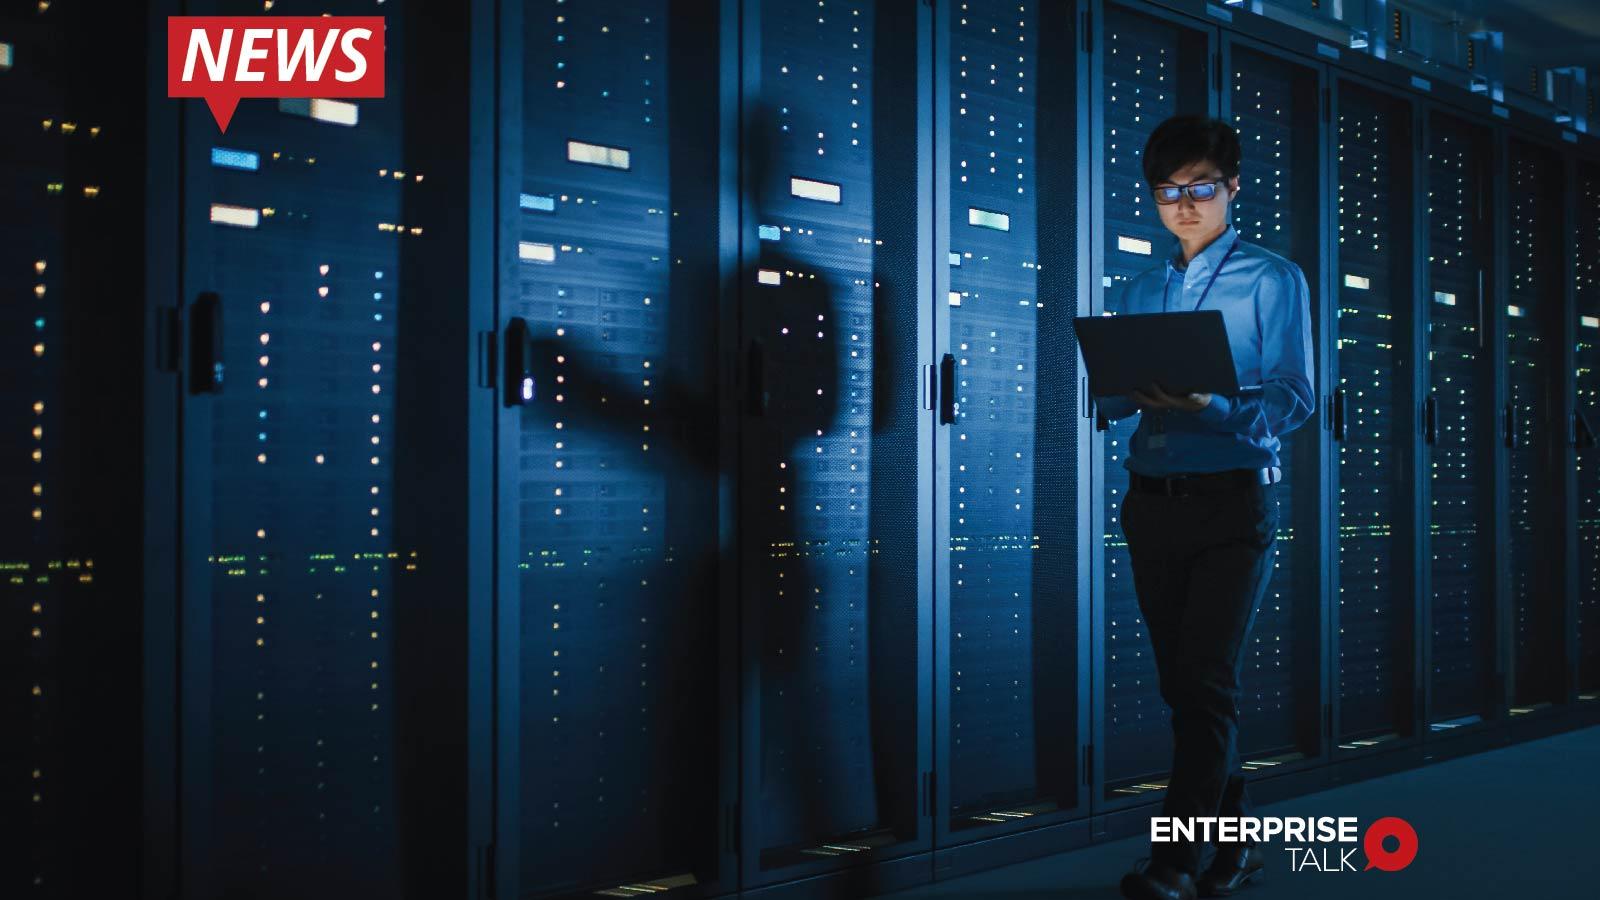 DataBank Announces Groundbreaking on its Third Data Center in Minnesota